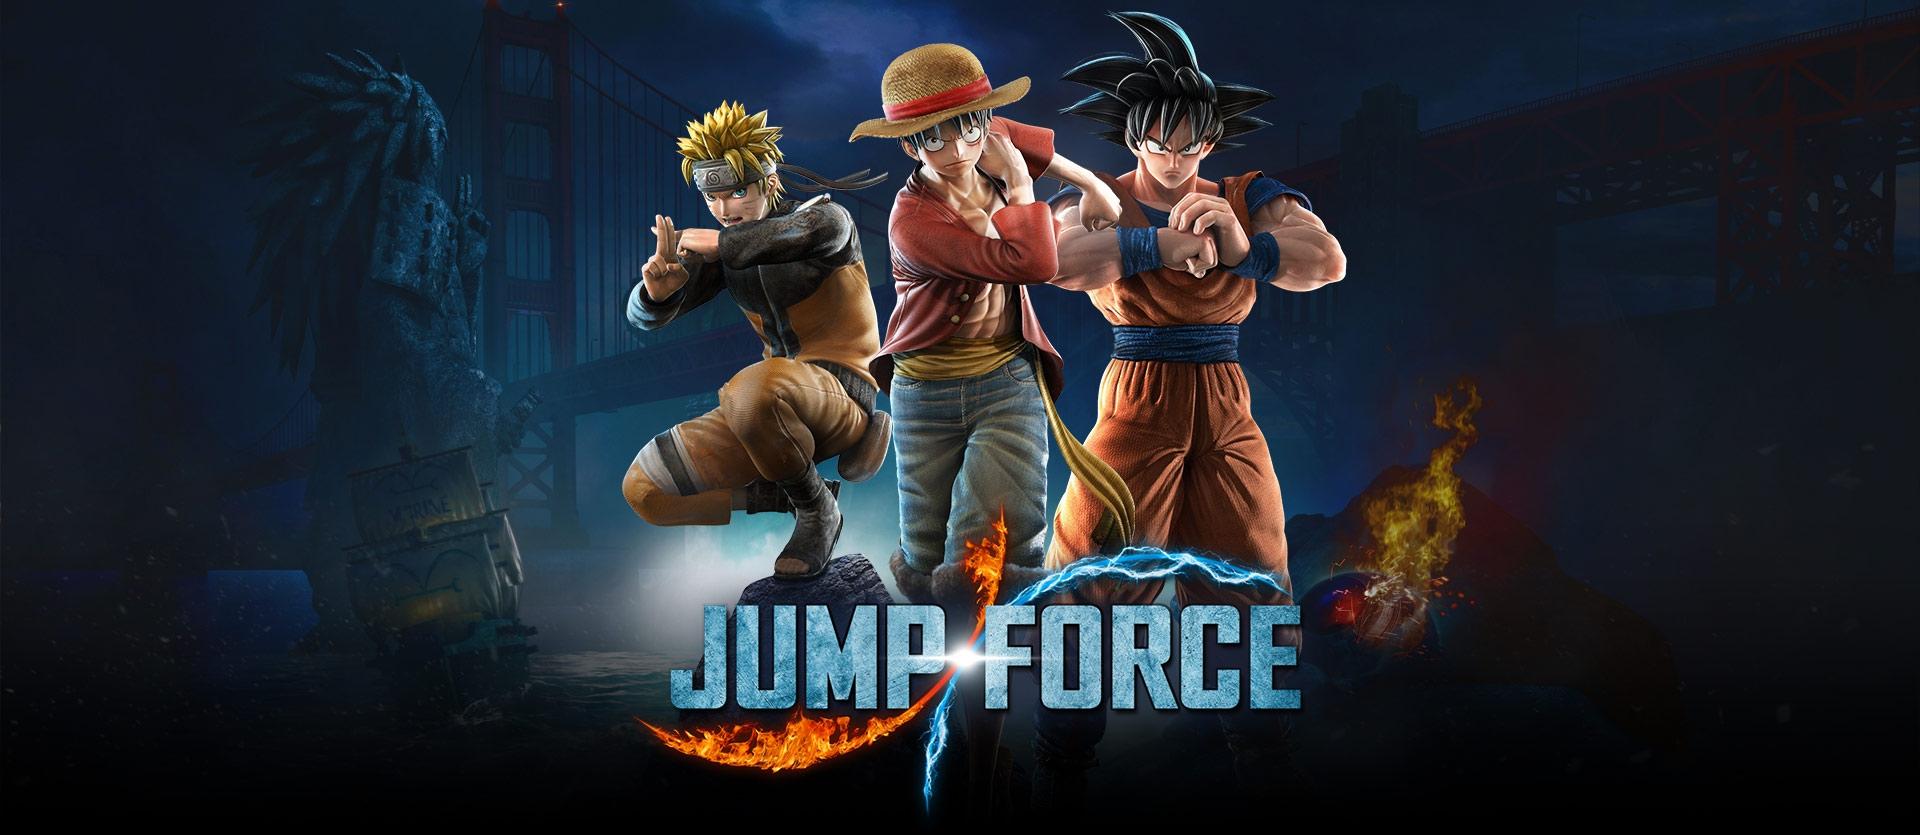 Bandai Namco svela la road-map per i DLC di Jump Force